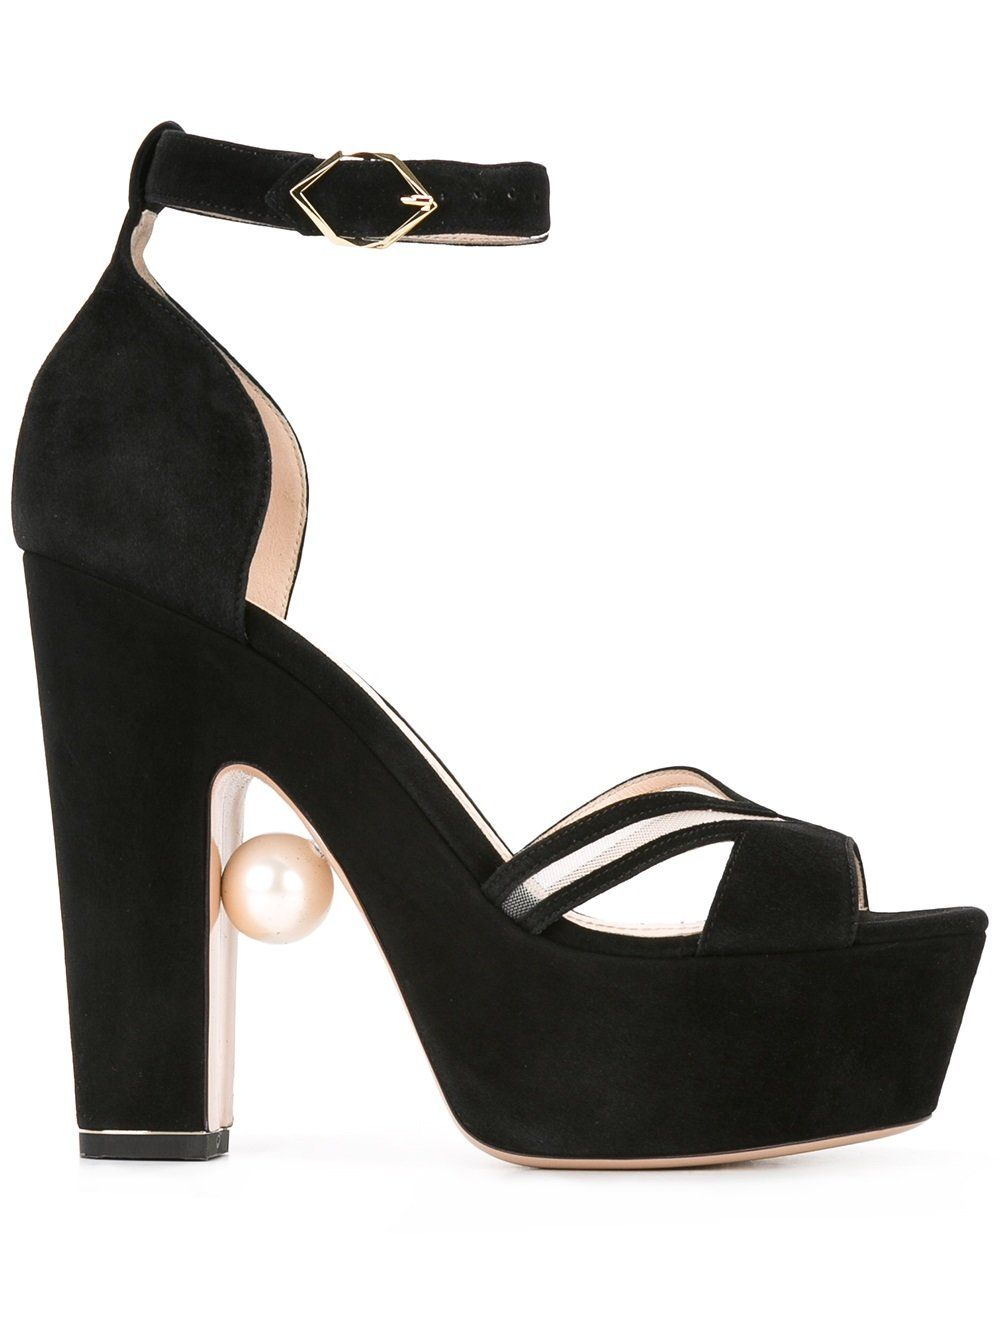 Maya Pearl Platform Sandals 120mm - Black Nicholas Kirkwood Sale Collections Fast Delivery Cheap Online hRPNkW5